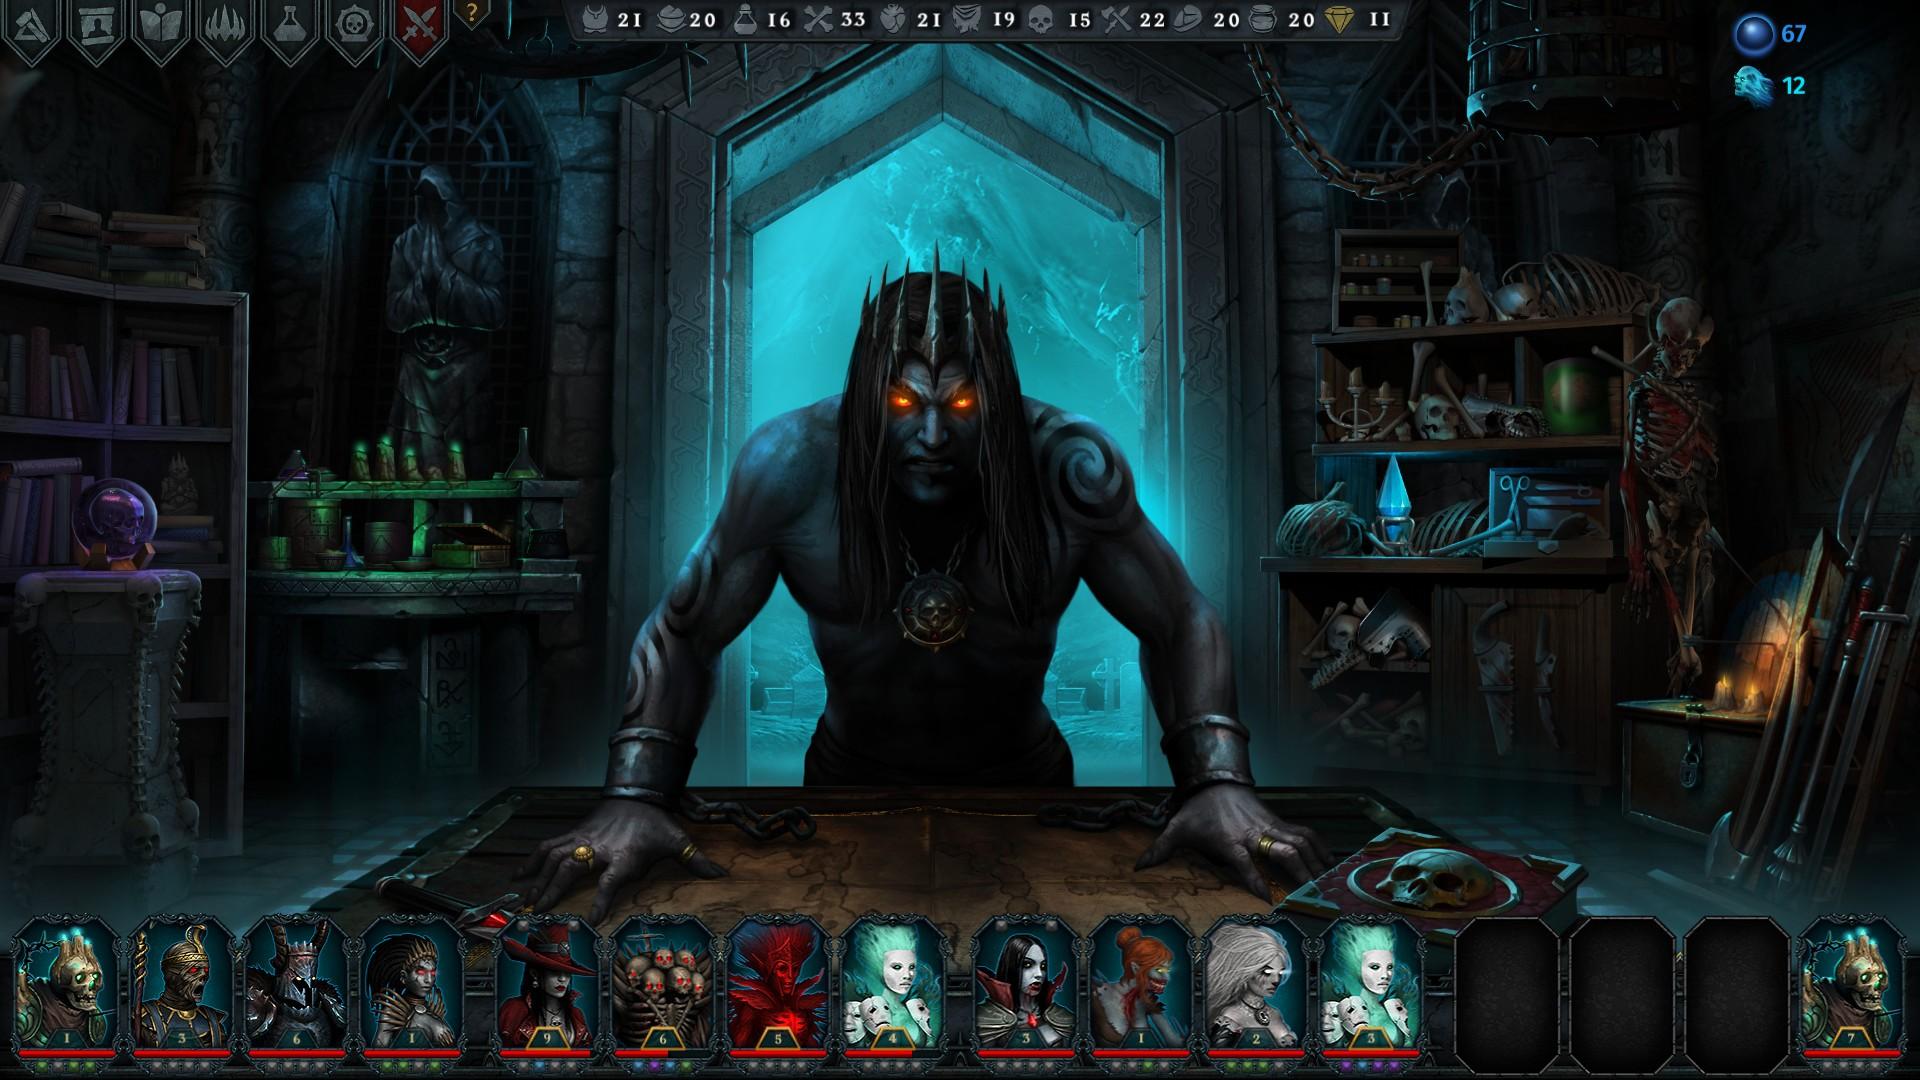 The Blood Eclipse Screenshot 1